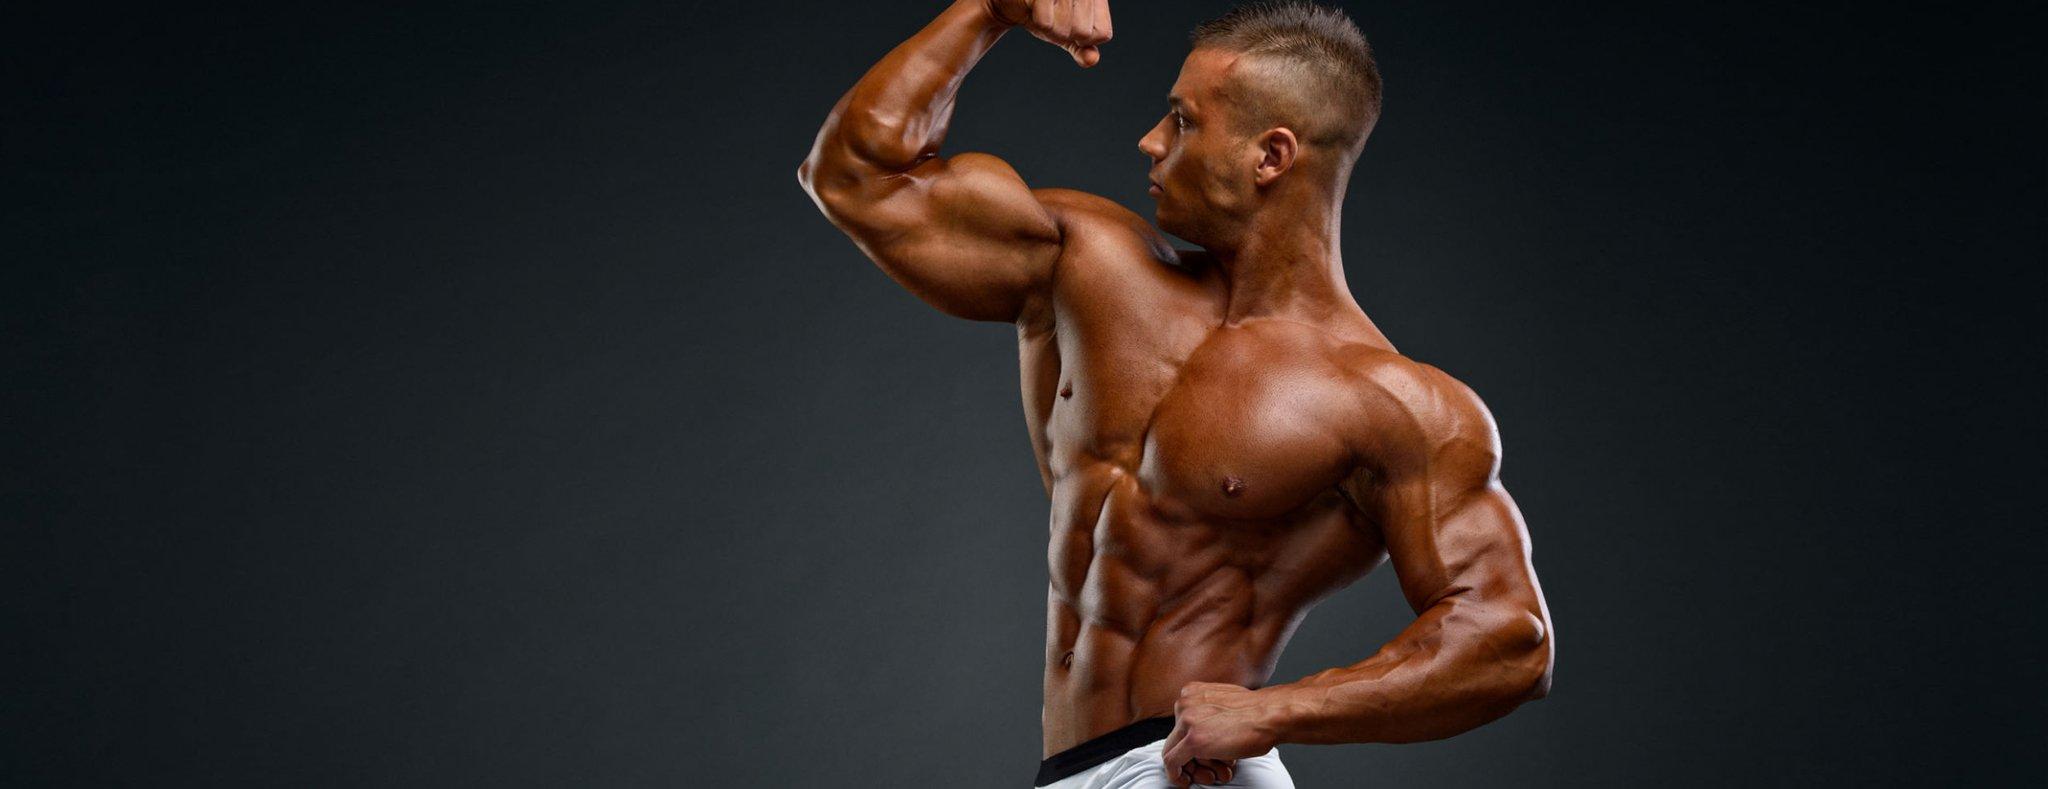 KEYS TO BUILDING BIGGER ARMS